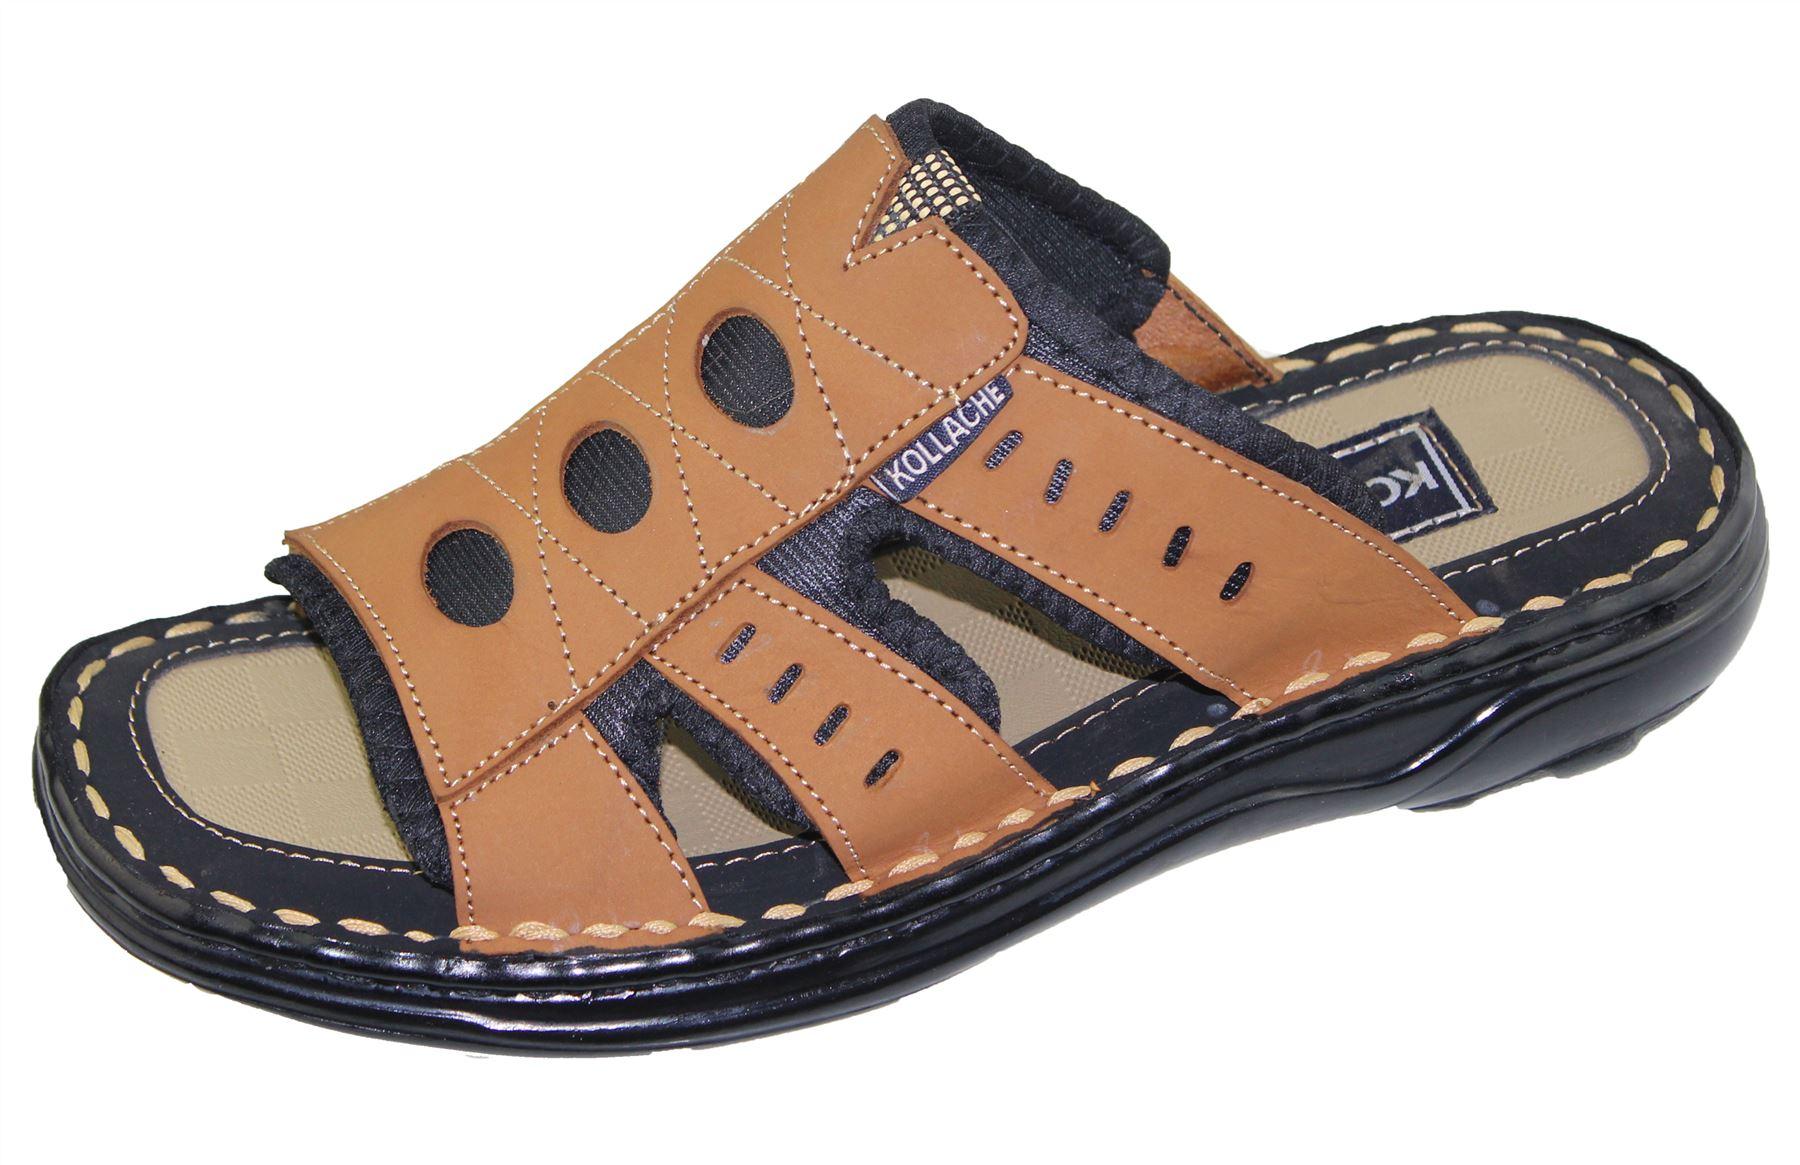 Mens-Slipper-Sandal-Sports-Beach-Buckle-Walking-Fashion-Summer-Casual-Shoes-Size miniatura 28